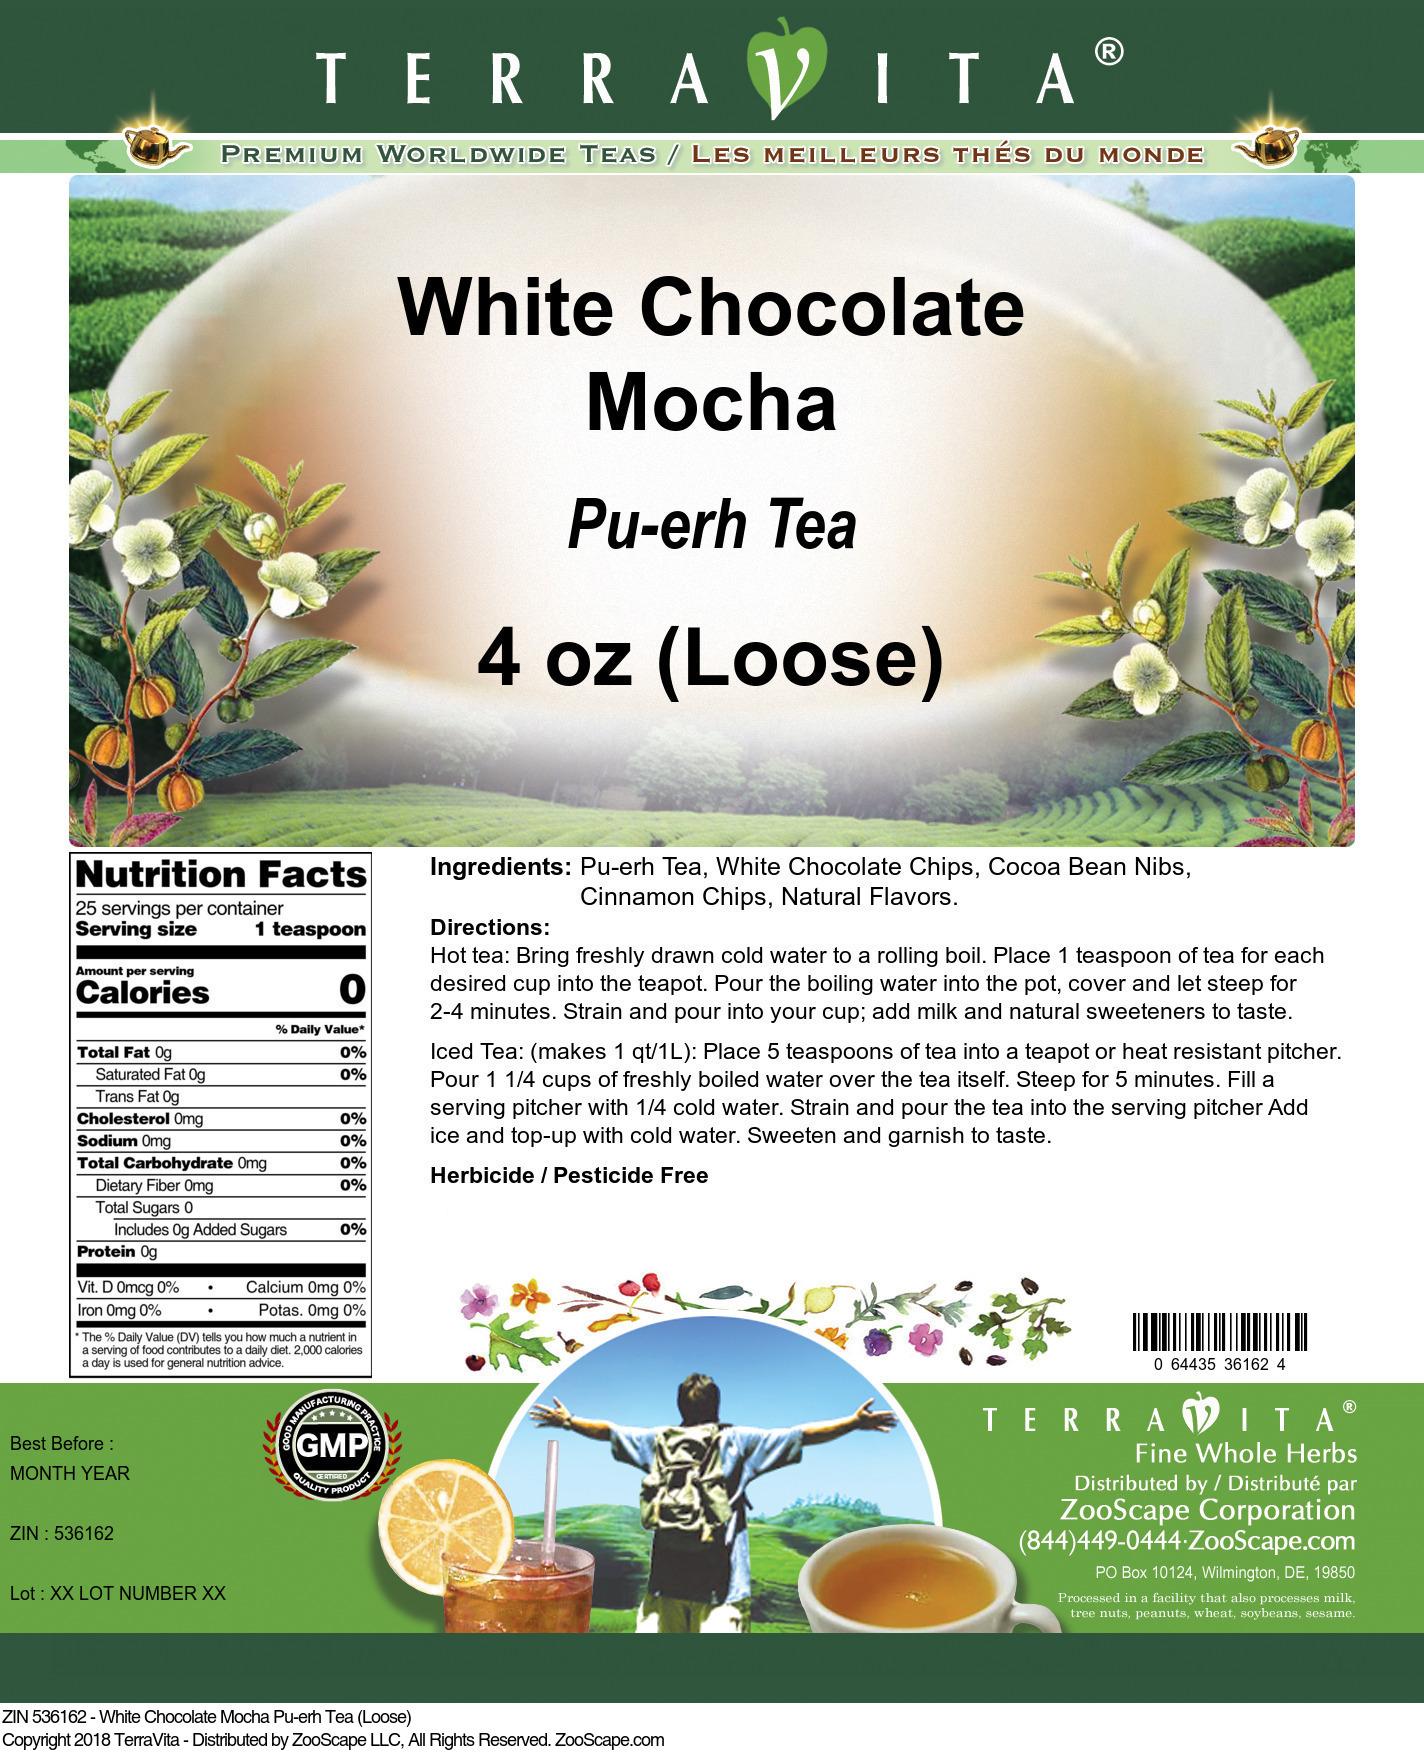 White Chocolate Mocha Pu-erh Tea